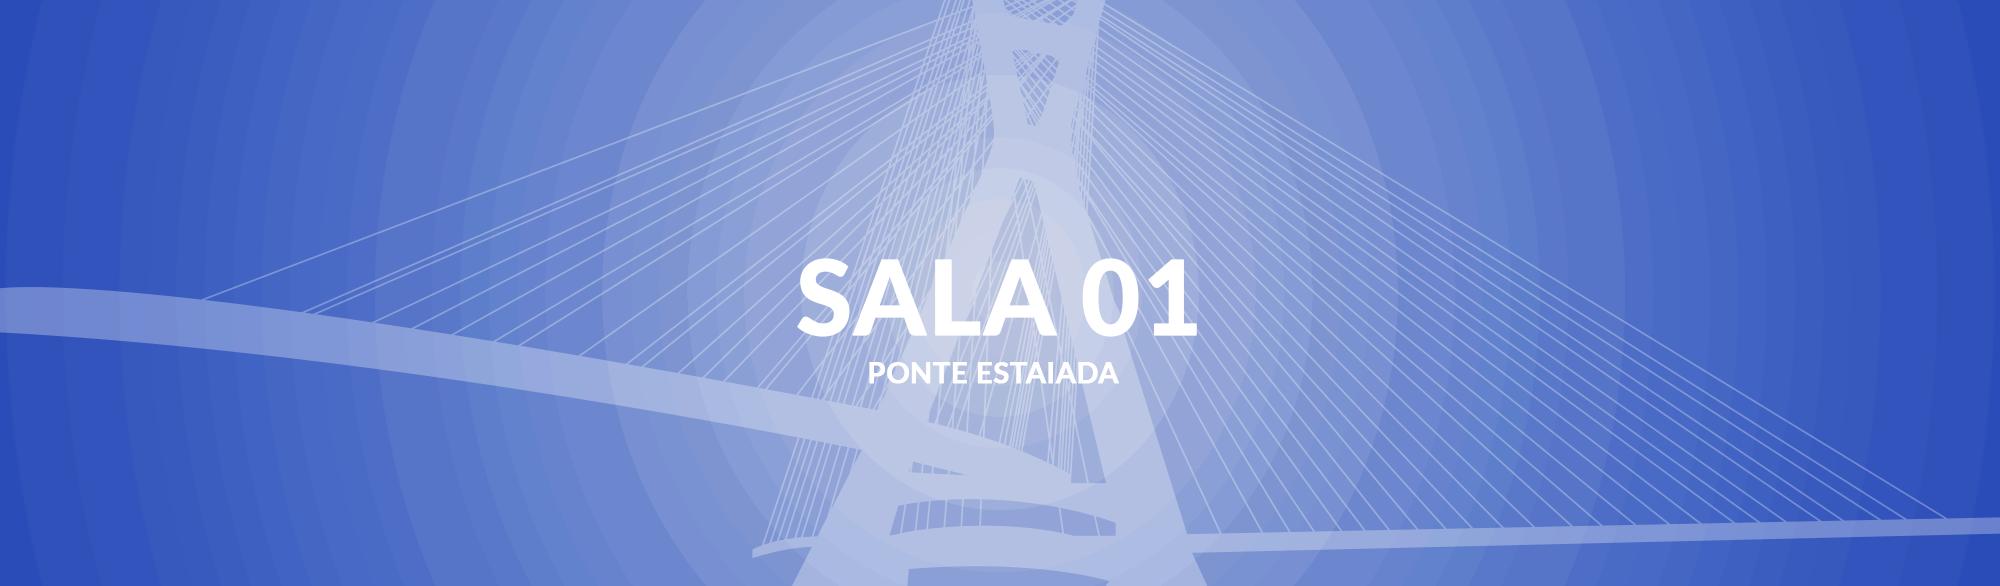 Banner dia02 sala01